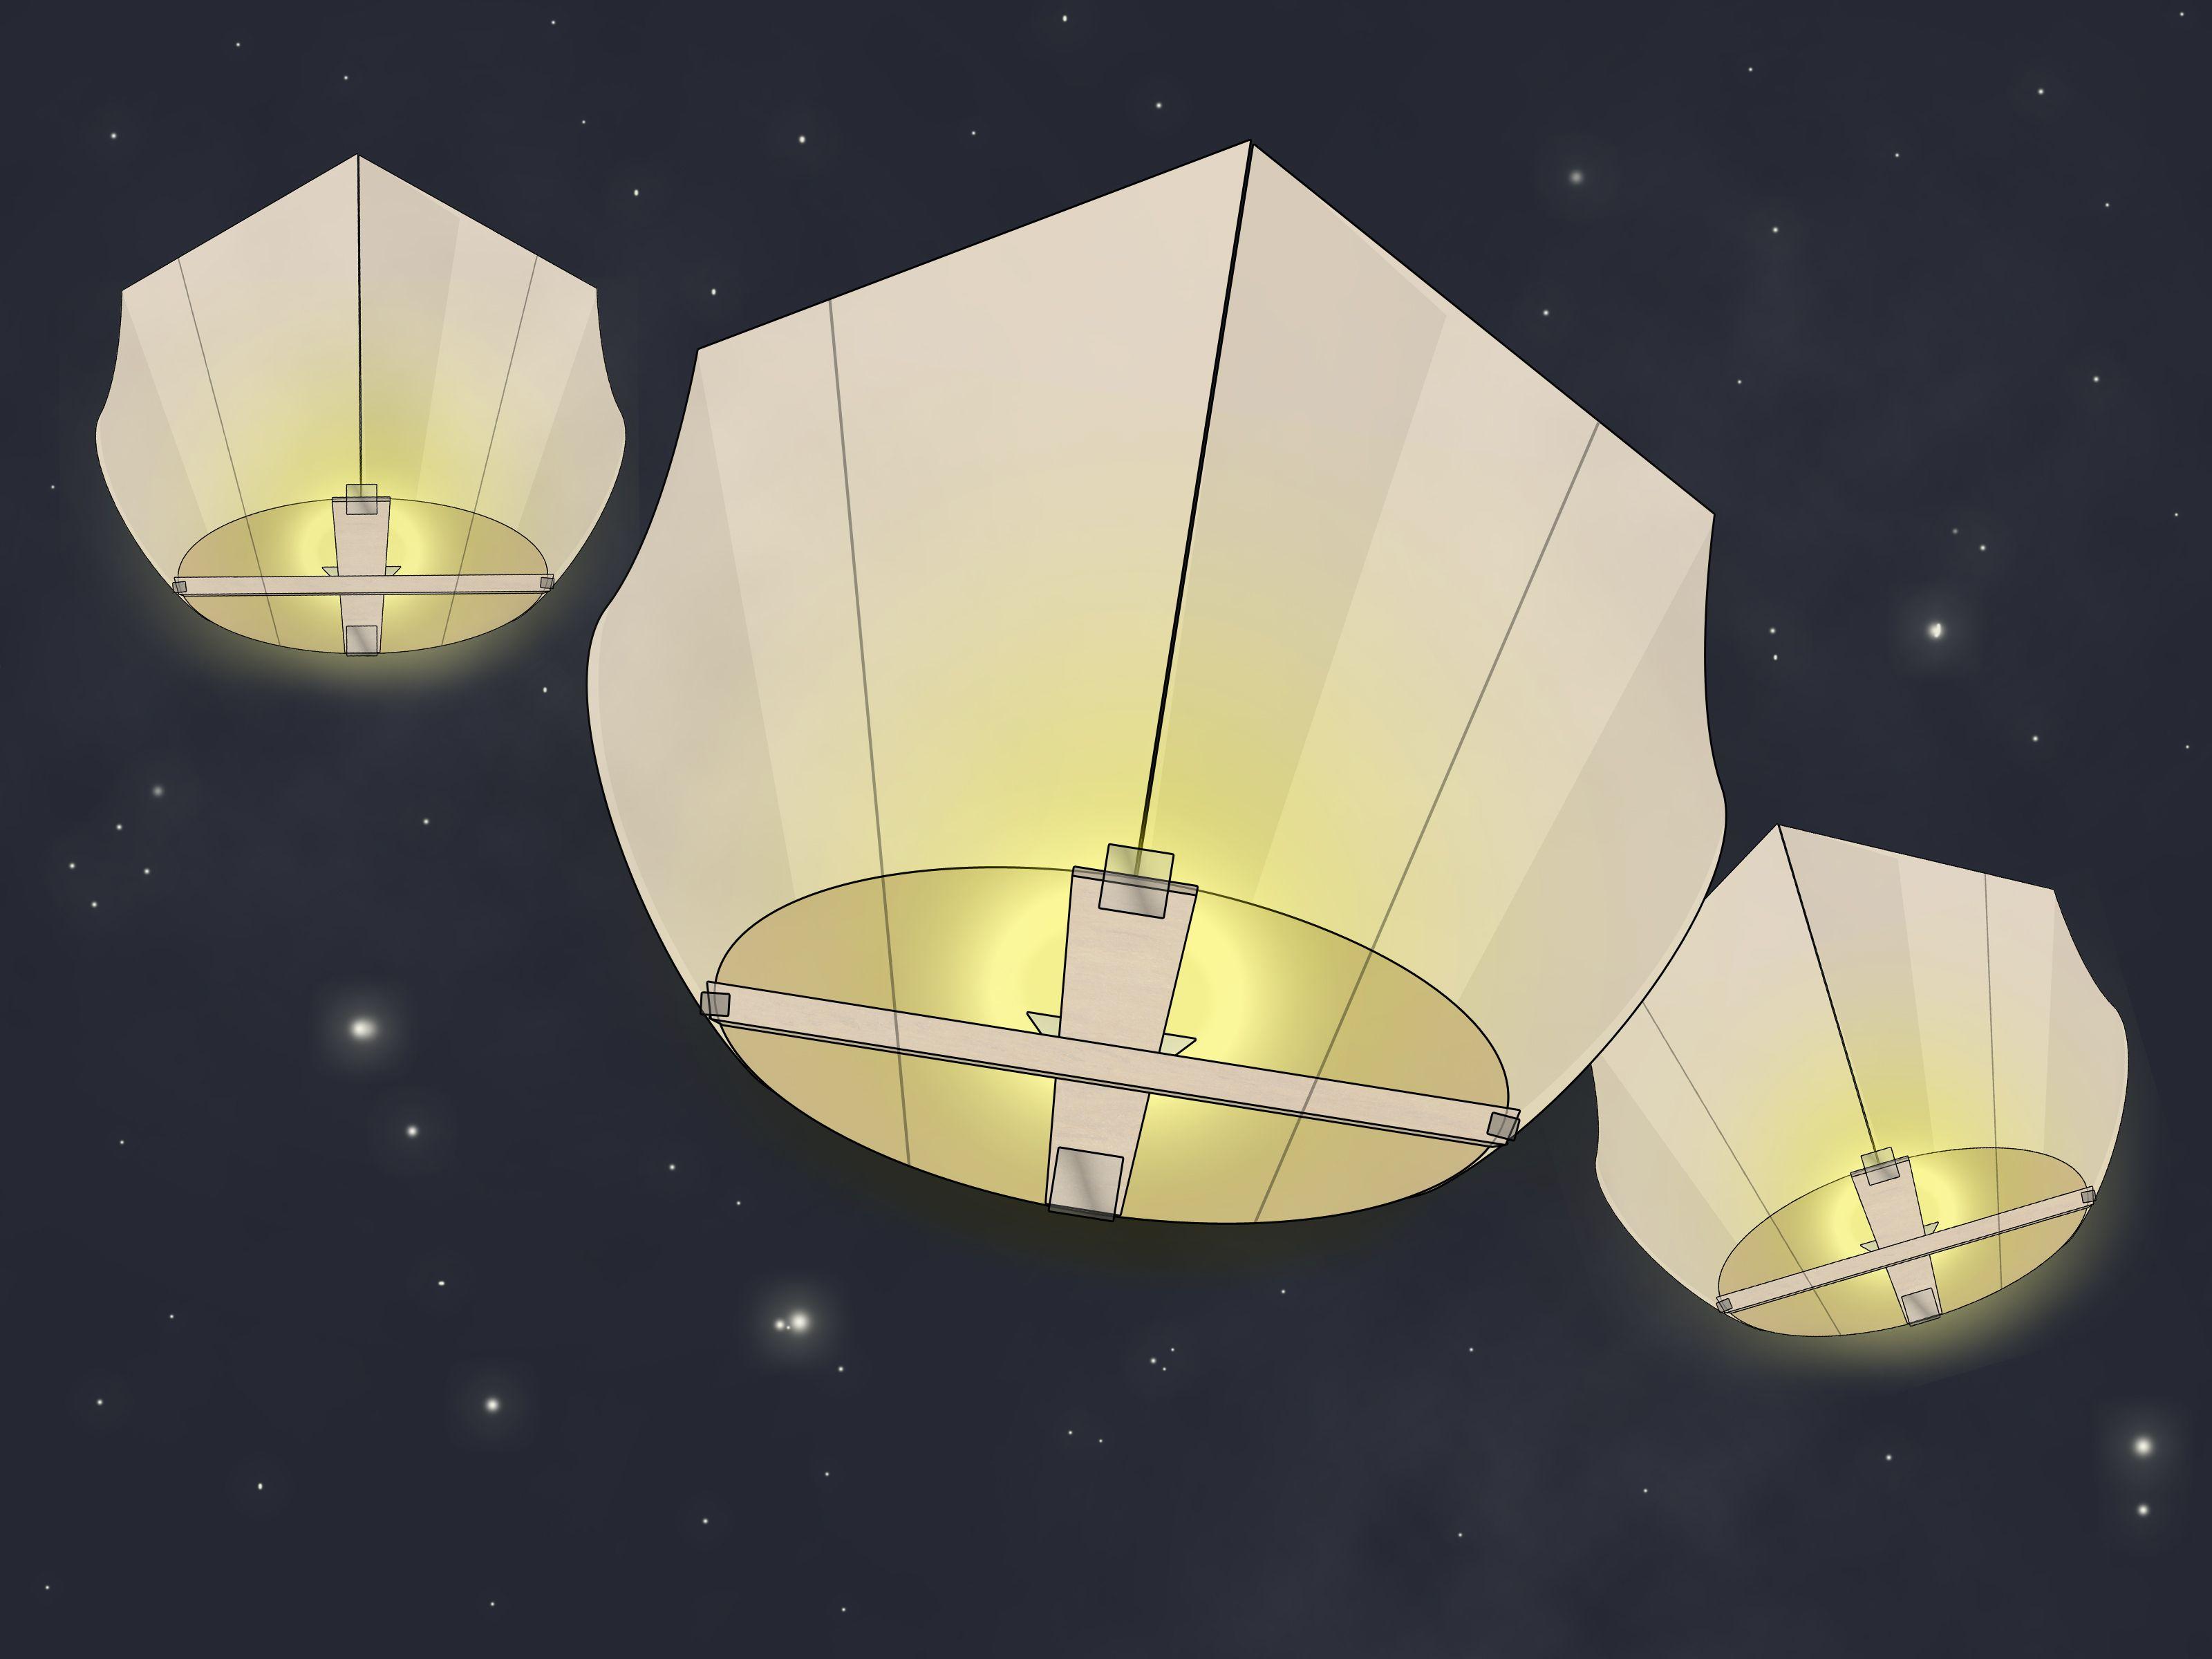 How To Make Sky Lanterns Sky Lanterns Floating Paper Lanterns Flying Paper Lanterns